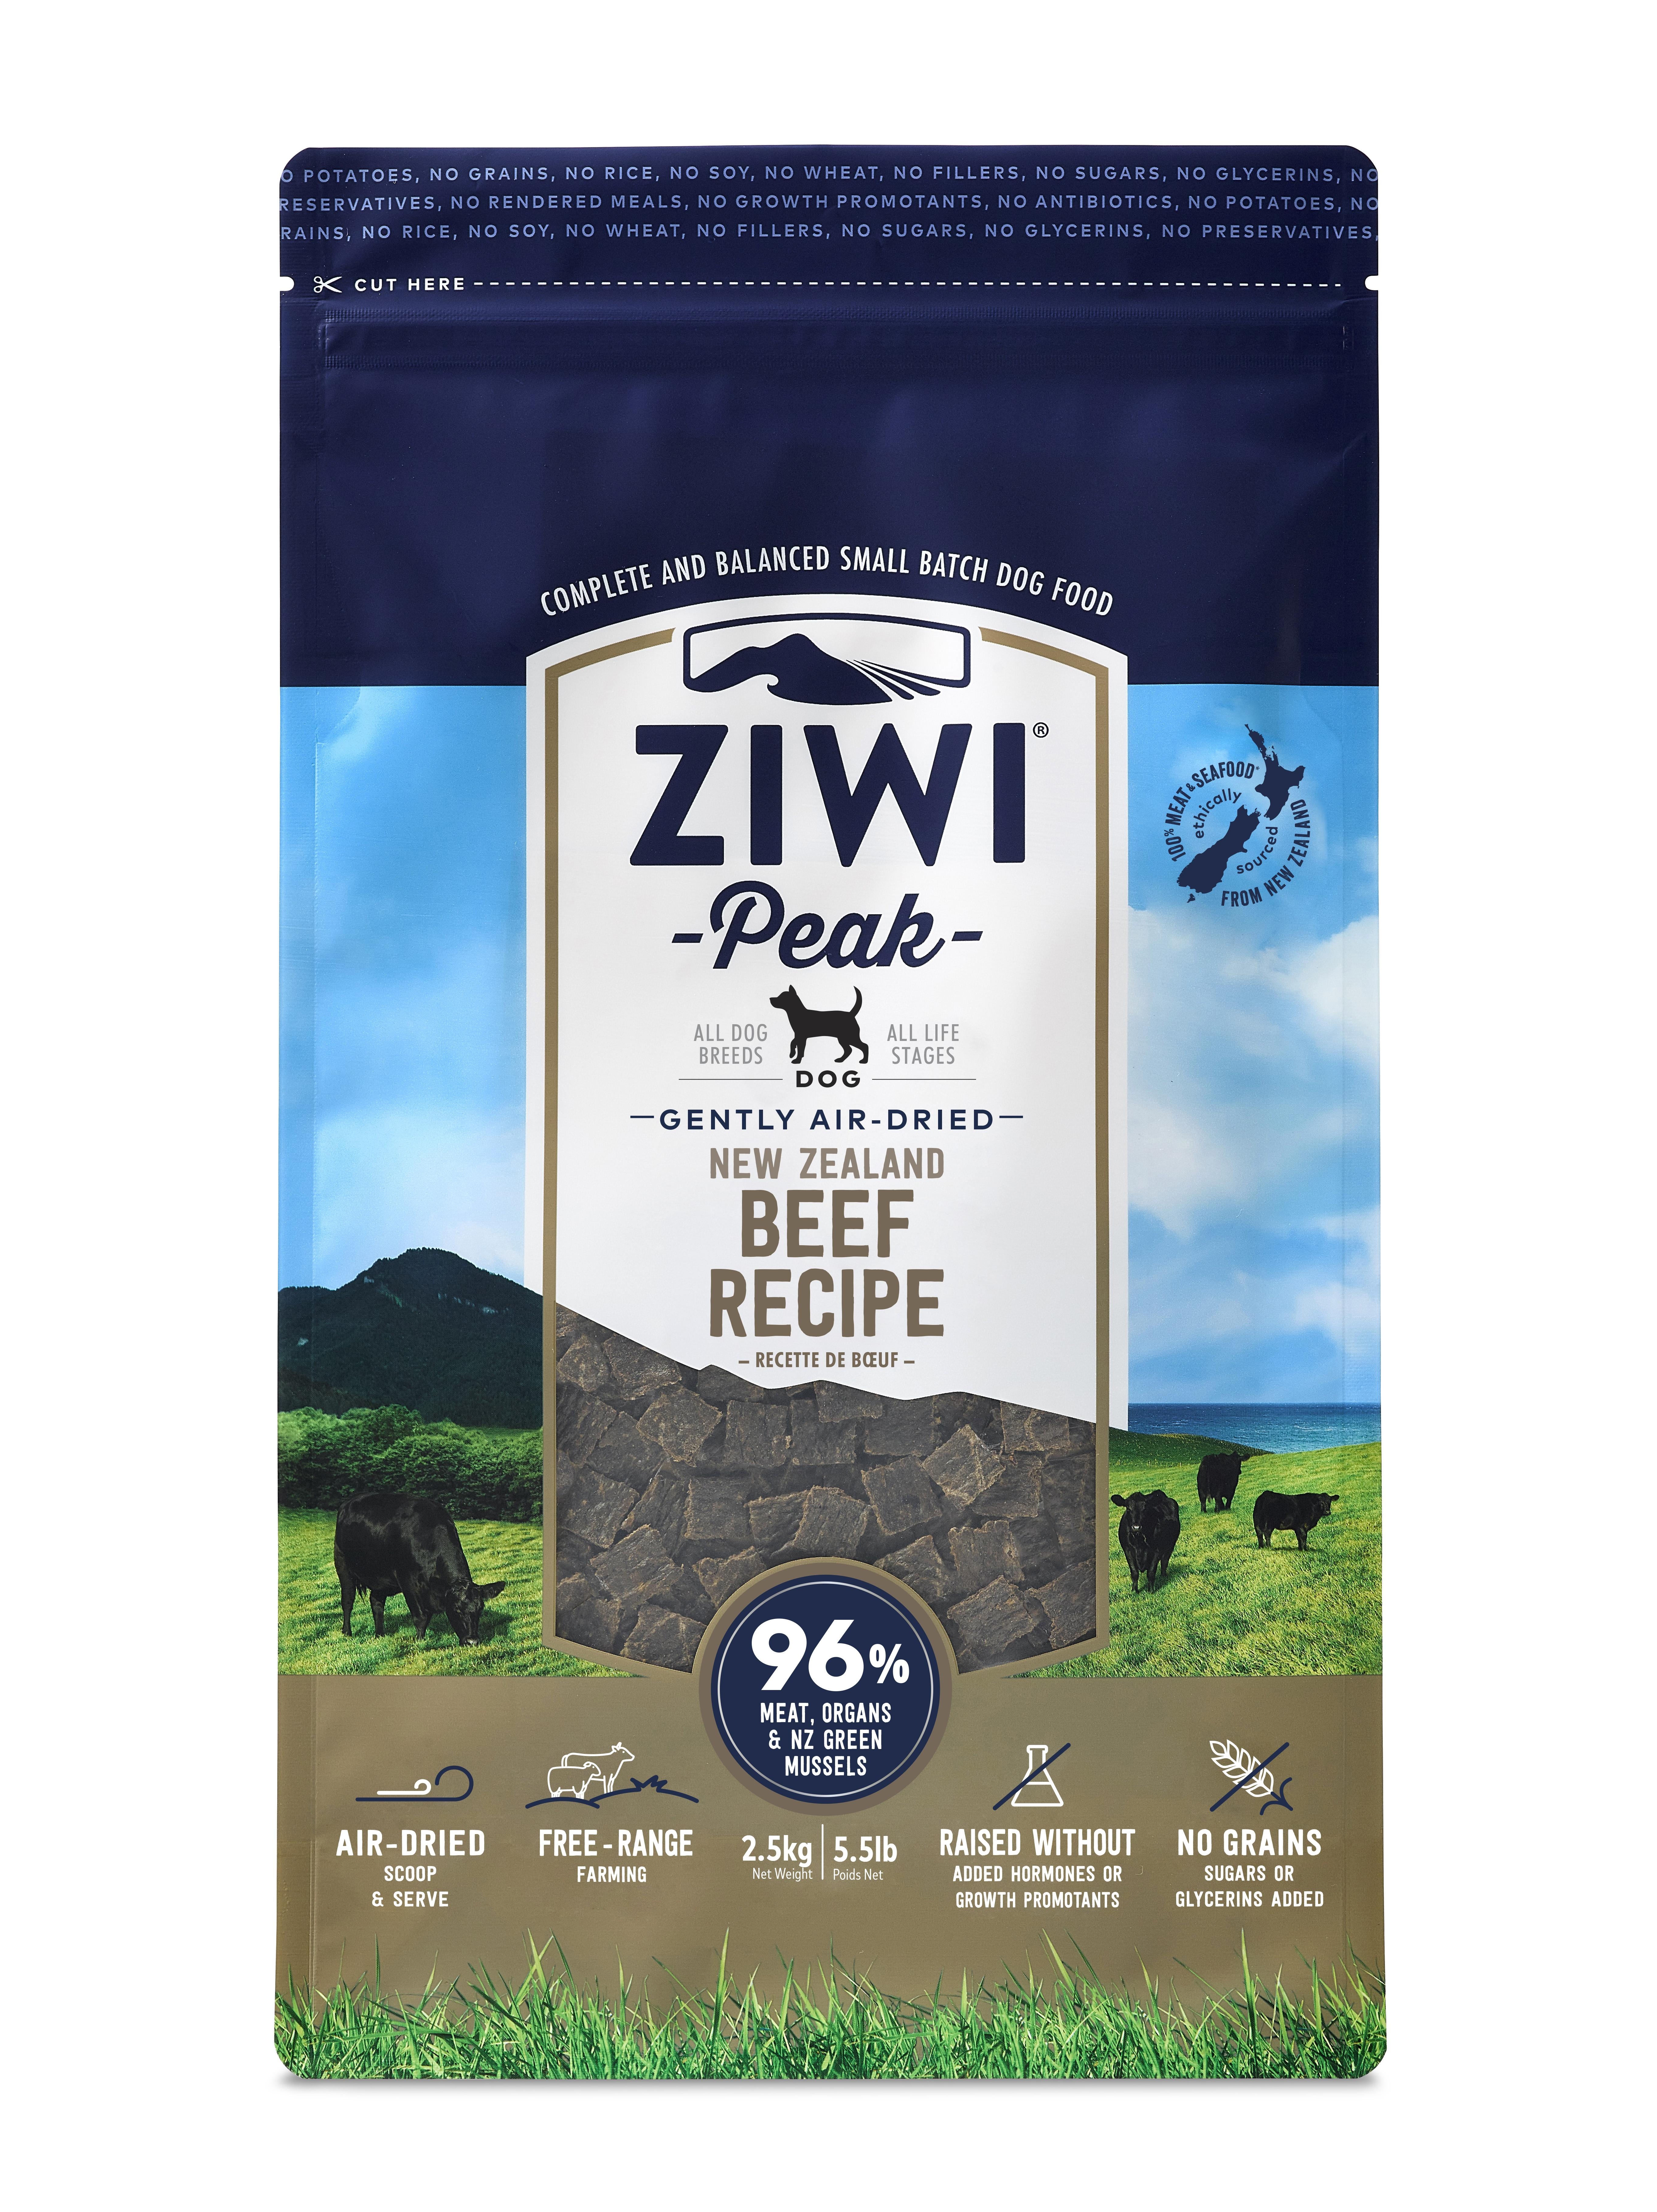 Ziwi Peak Dog Beef Recipe Grain-Free Air-Dried Dog Food, 5.5-lb bag